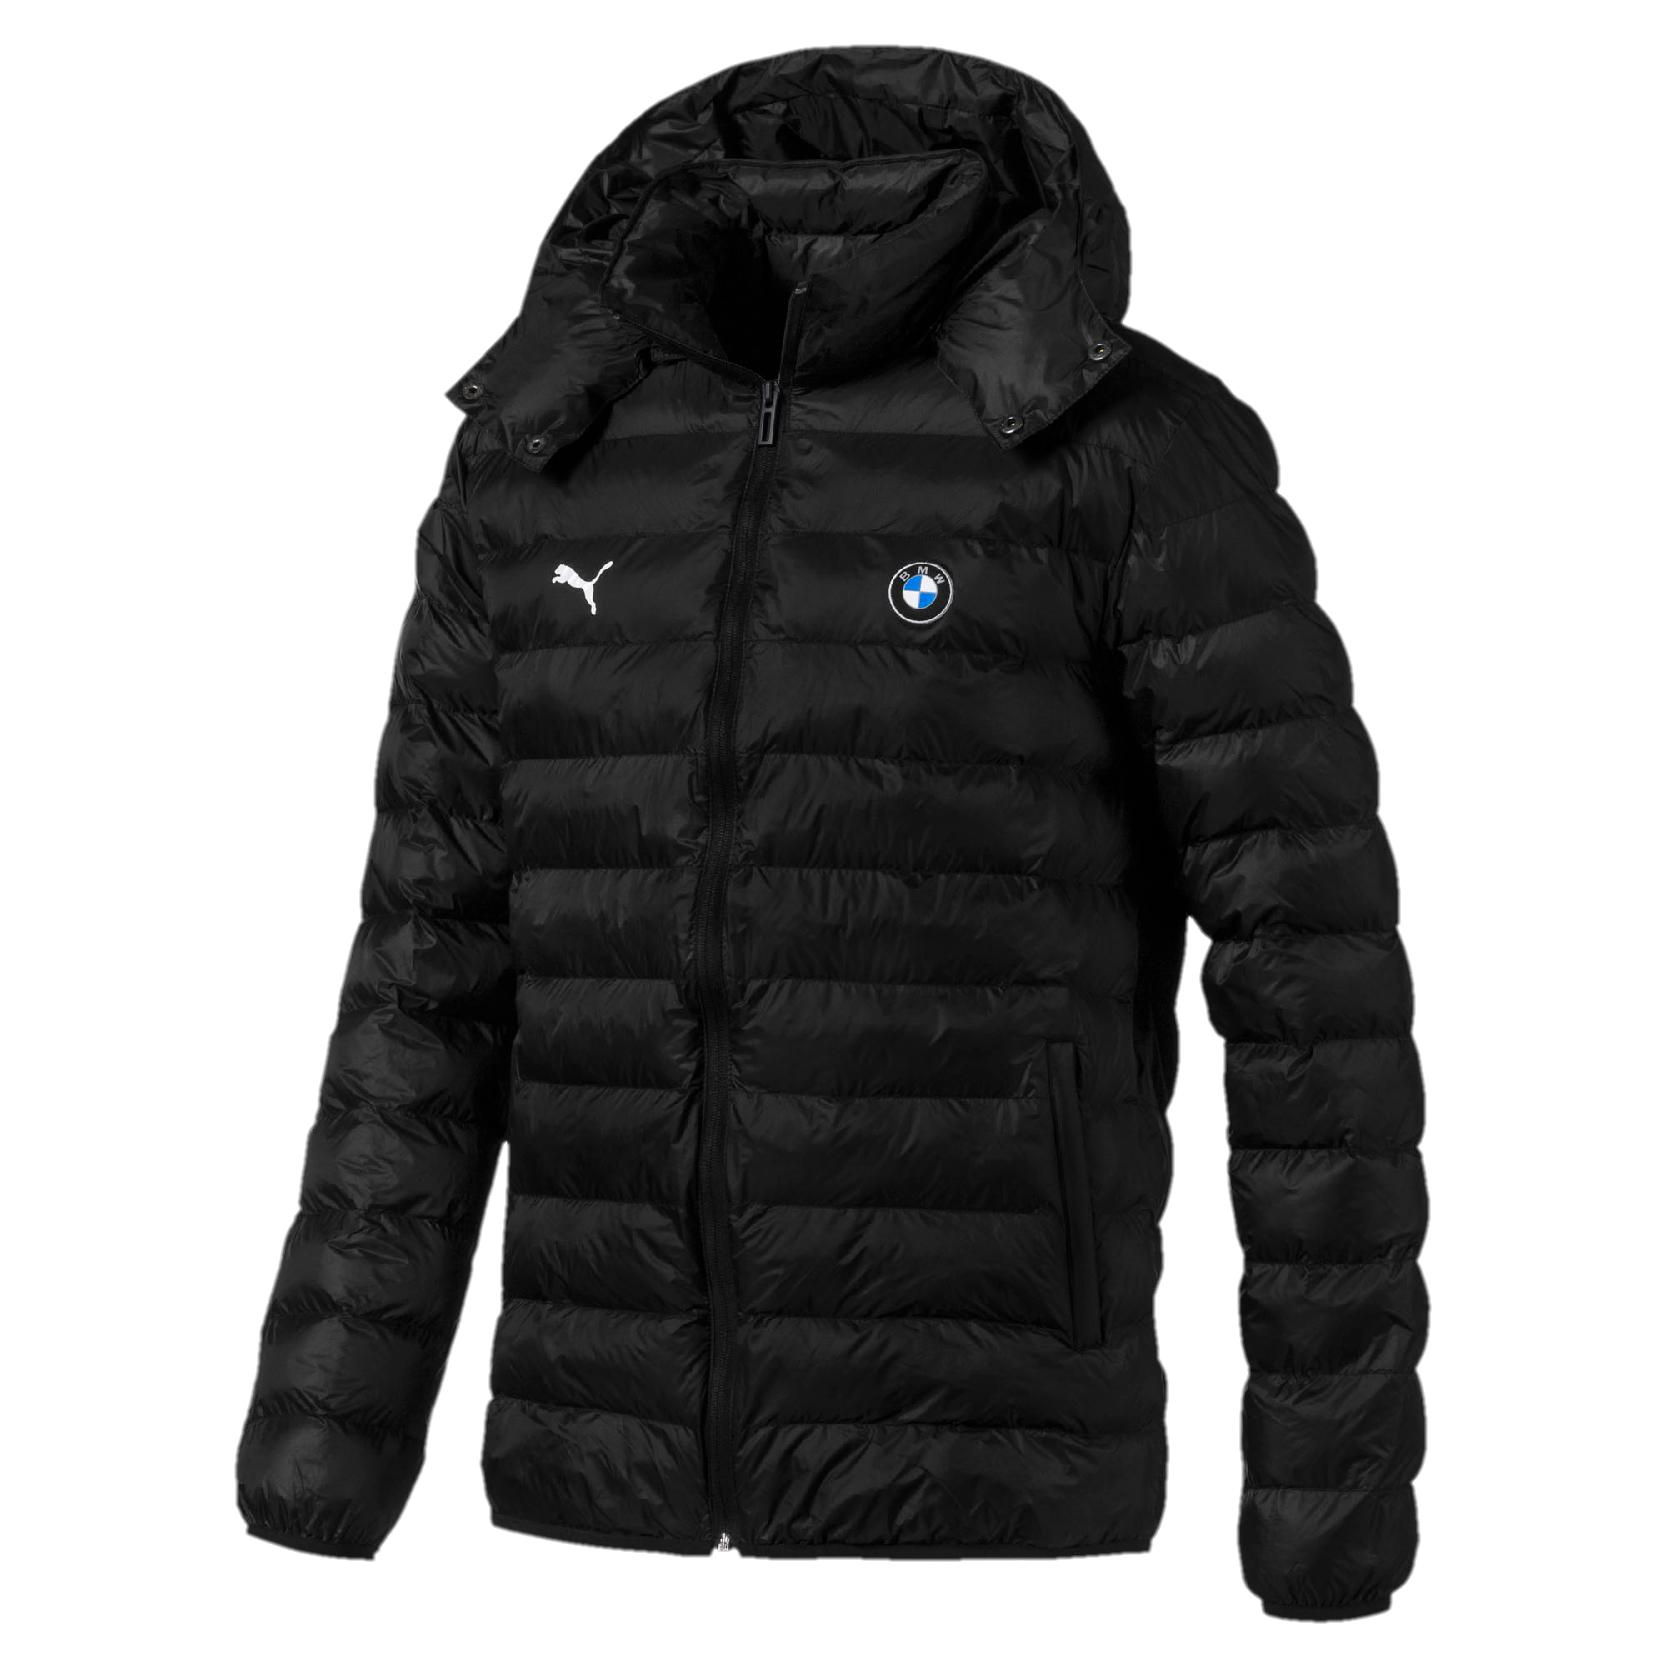 Куртка PUMA Bmw Mms Eco PackLite Jacket цена